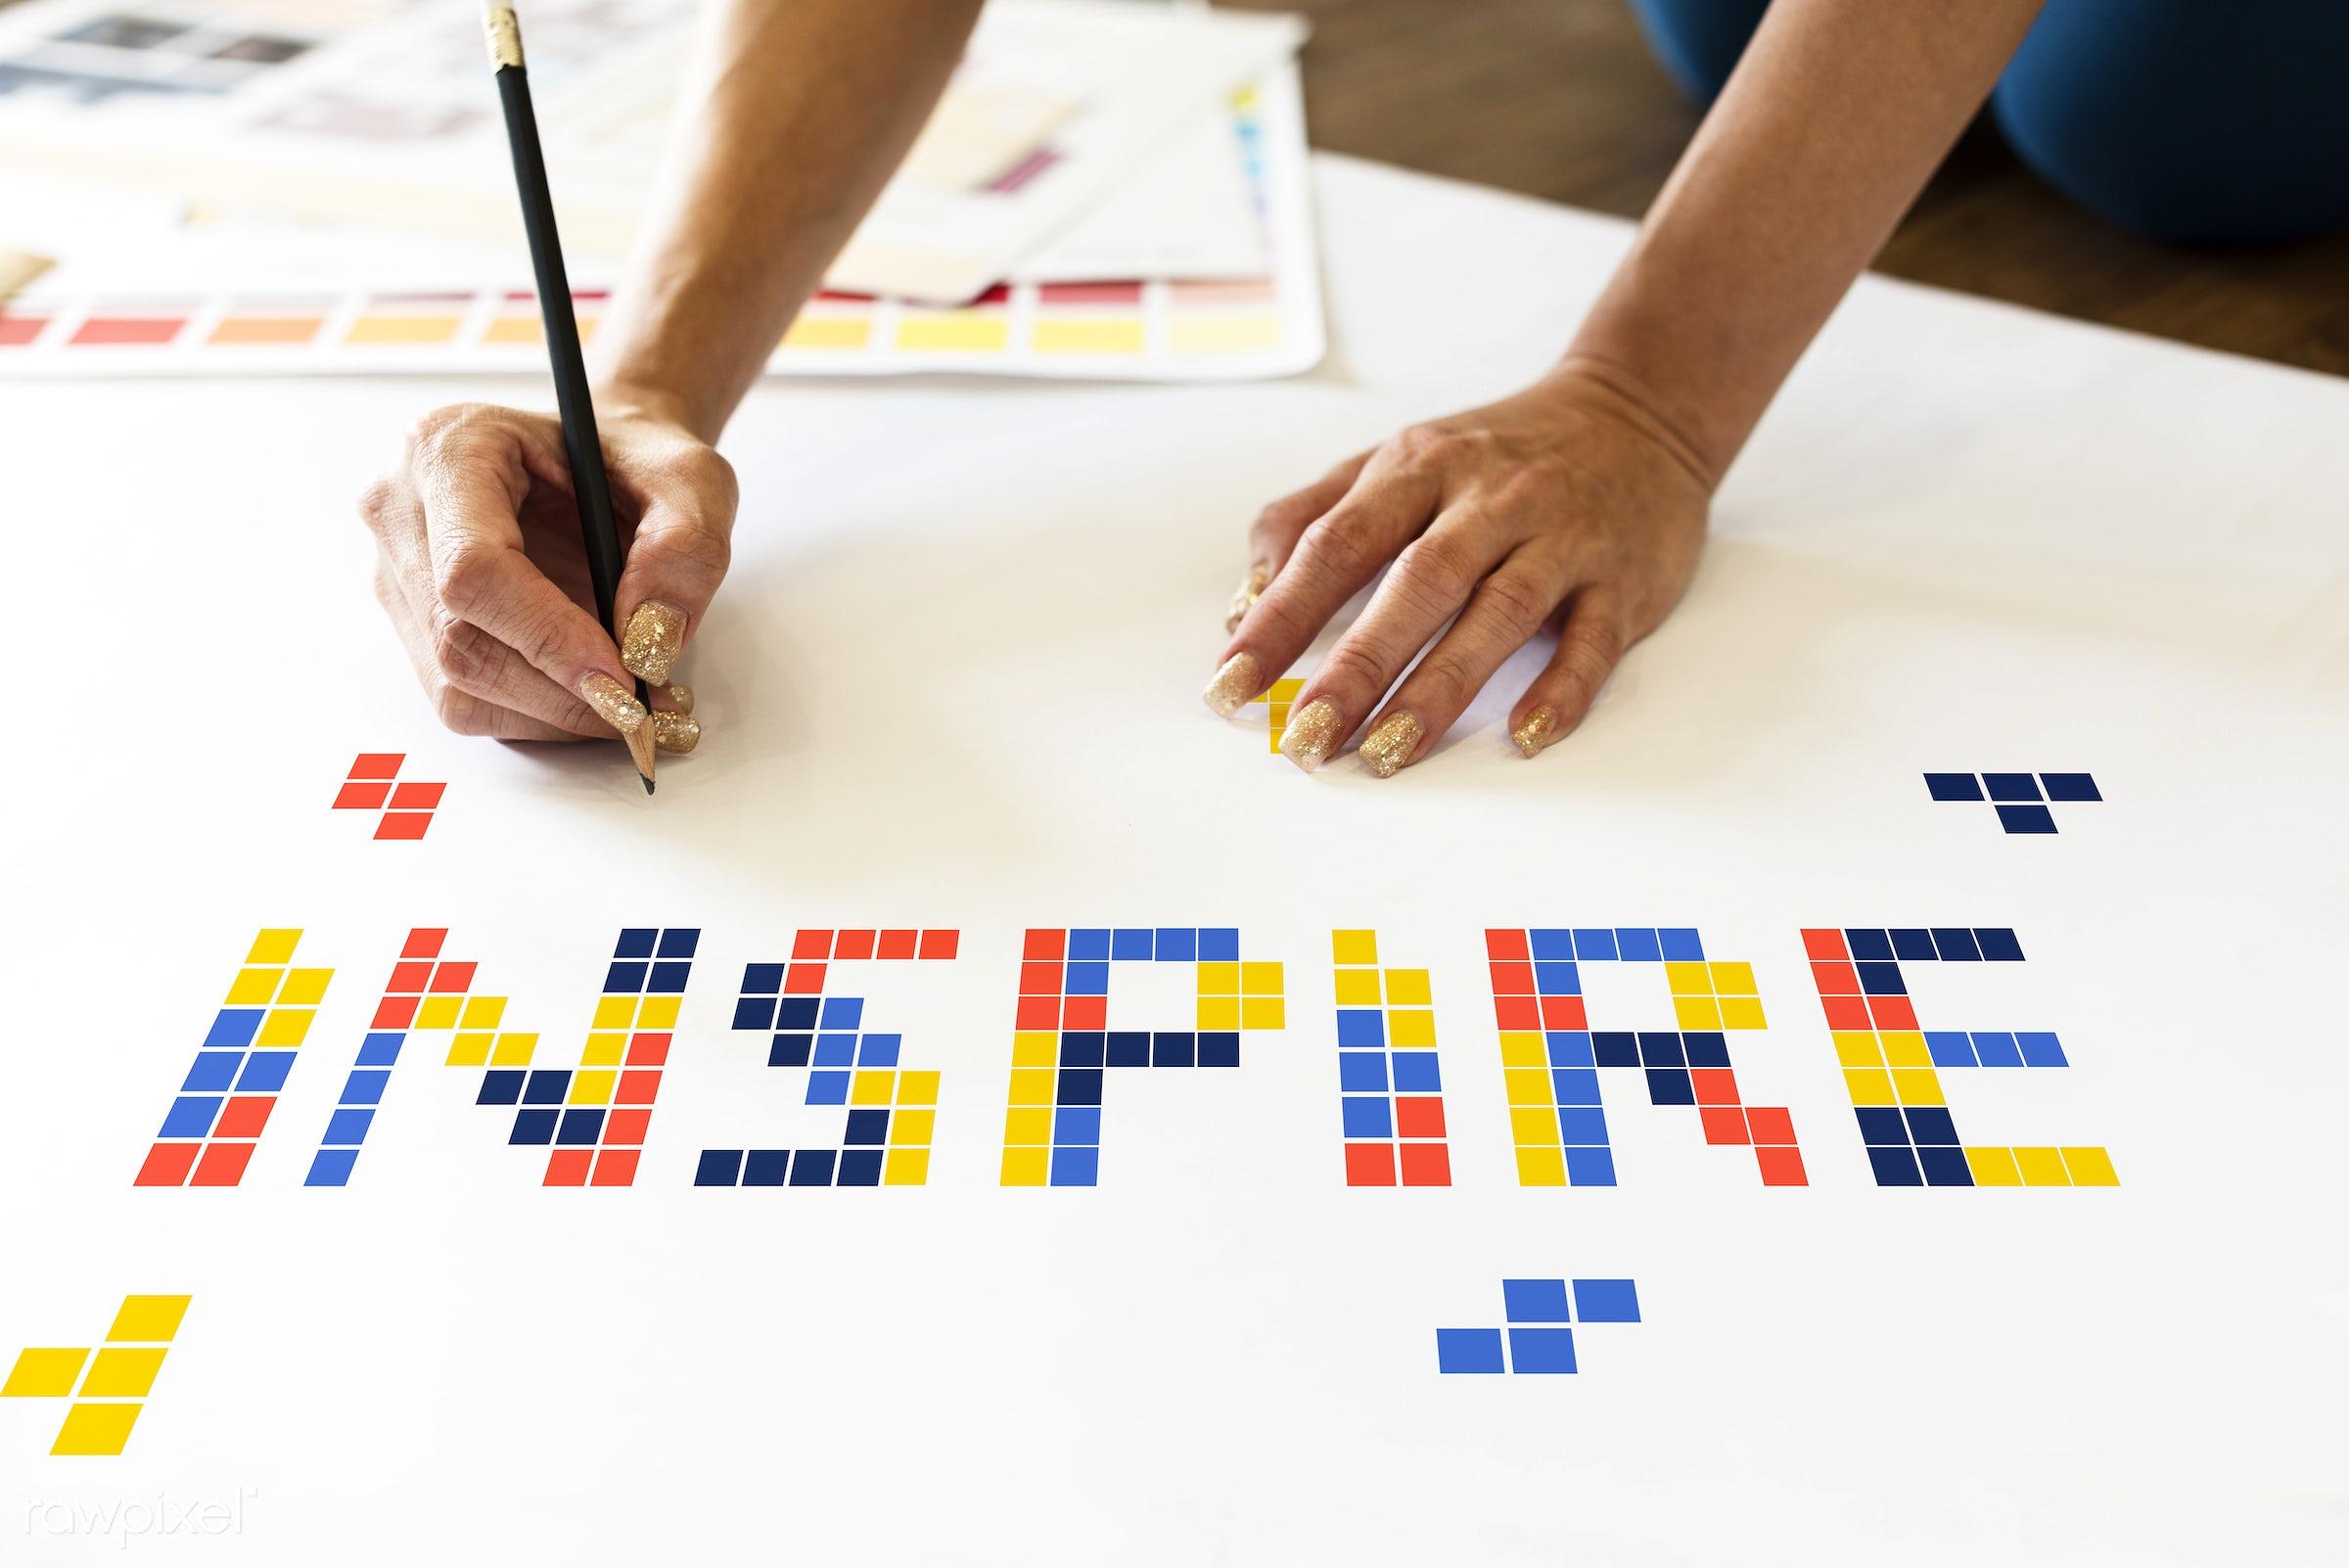 Inspire - 8 bit, art, artistry, block, creation, creative, creativity, design, drawing, game, graphic, graphics, hands,...